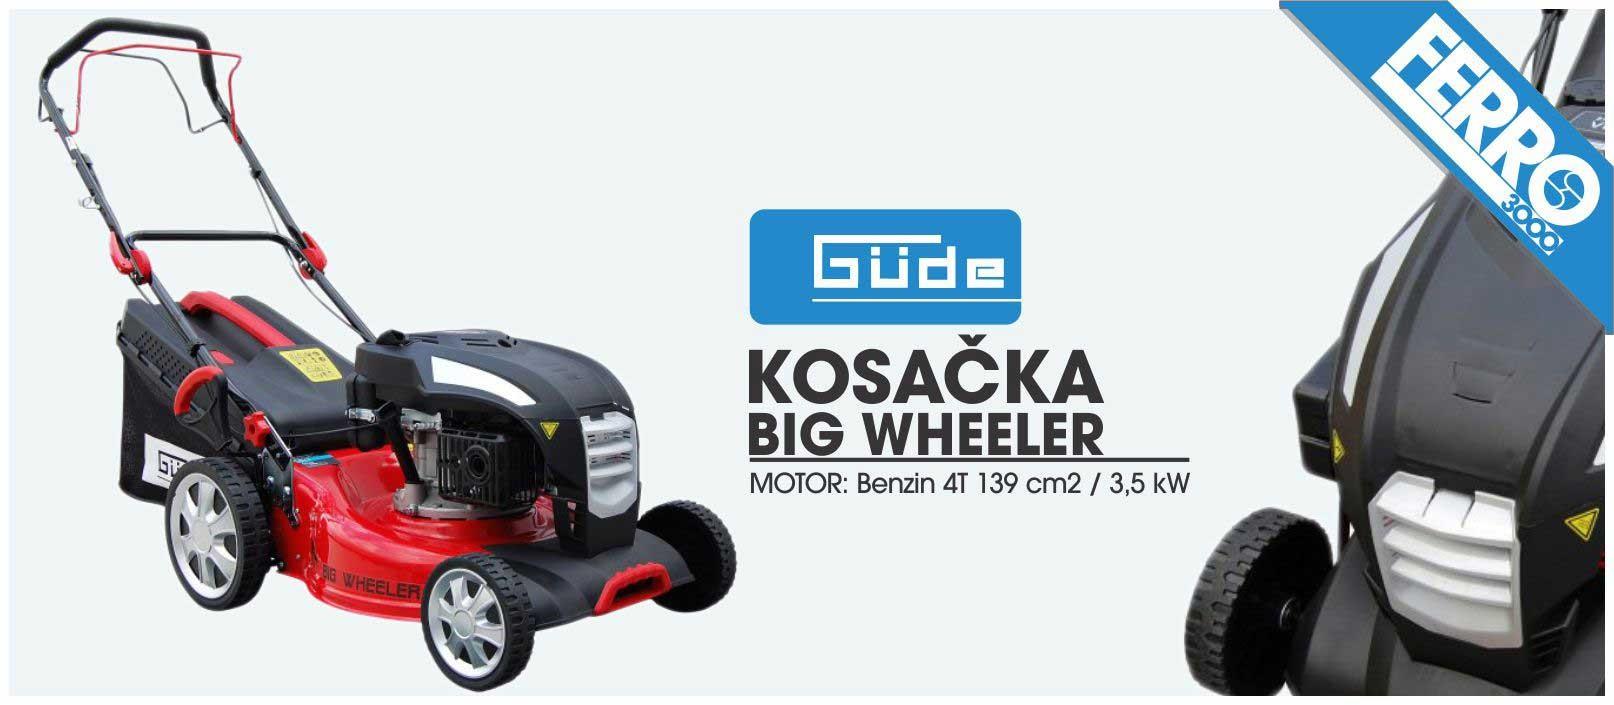 Kosacka Big wheeler